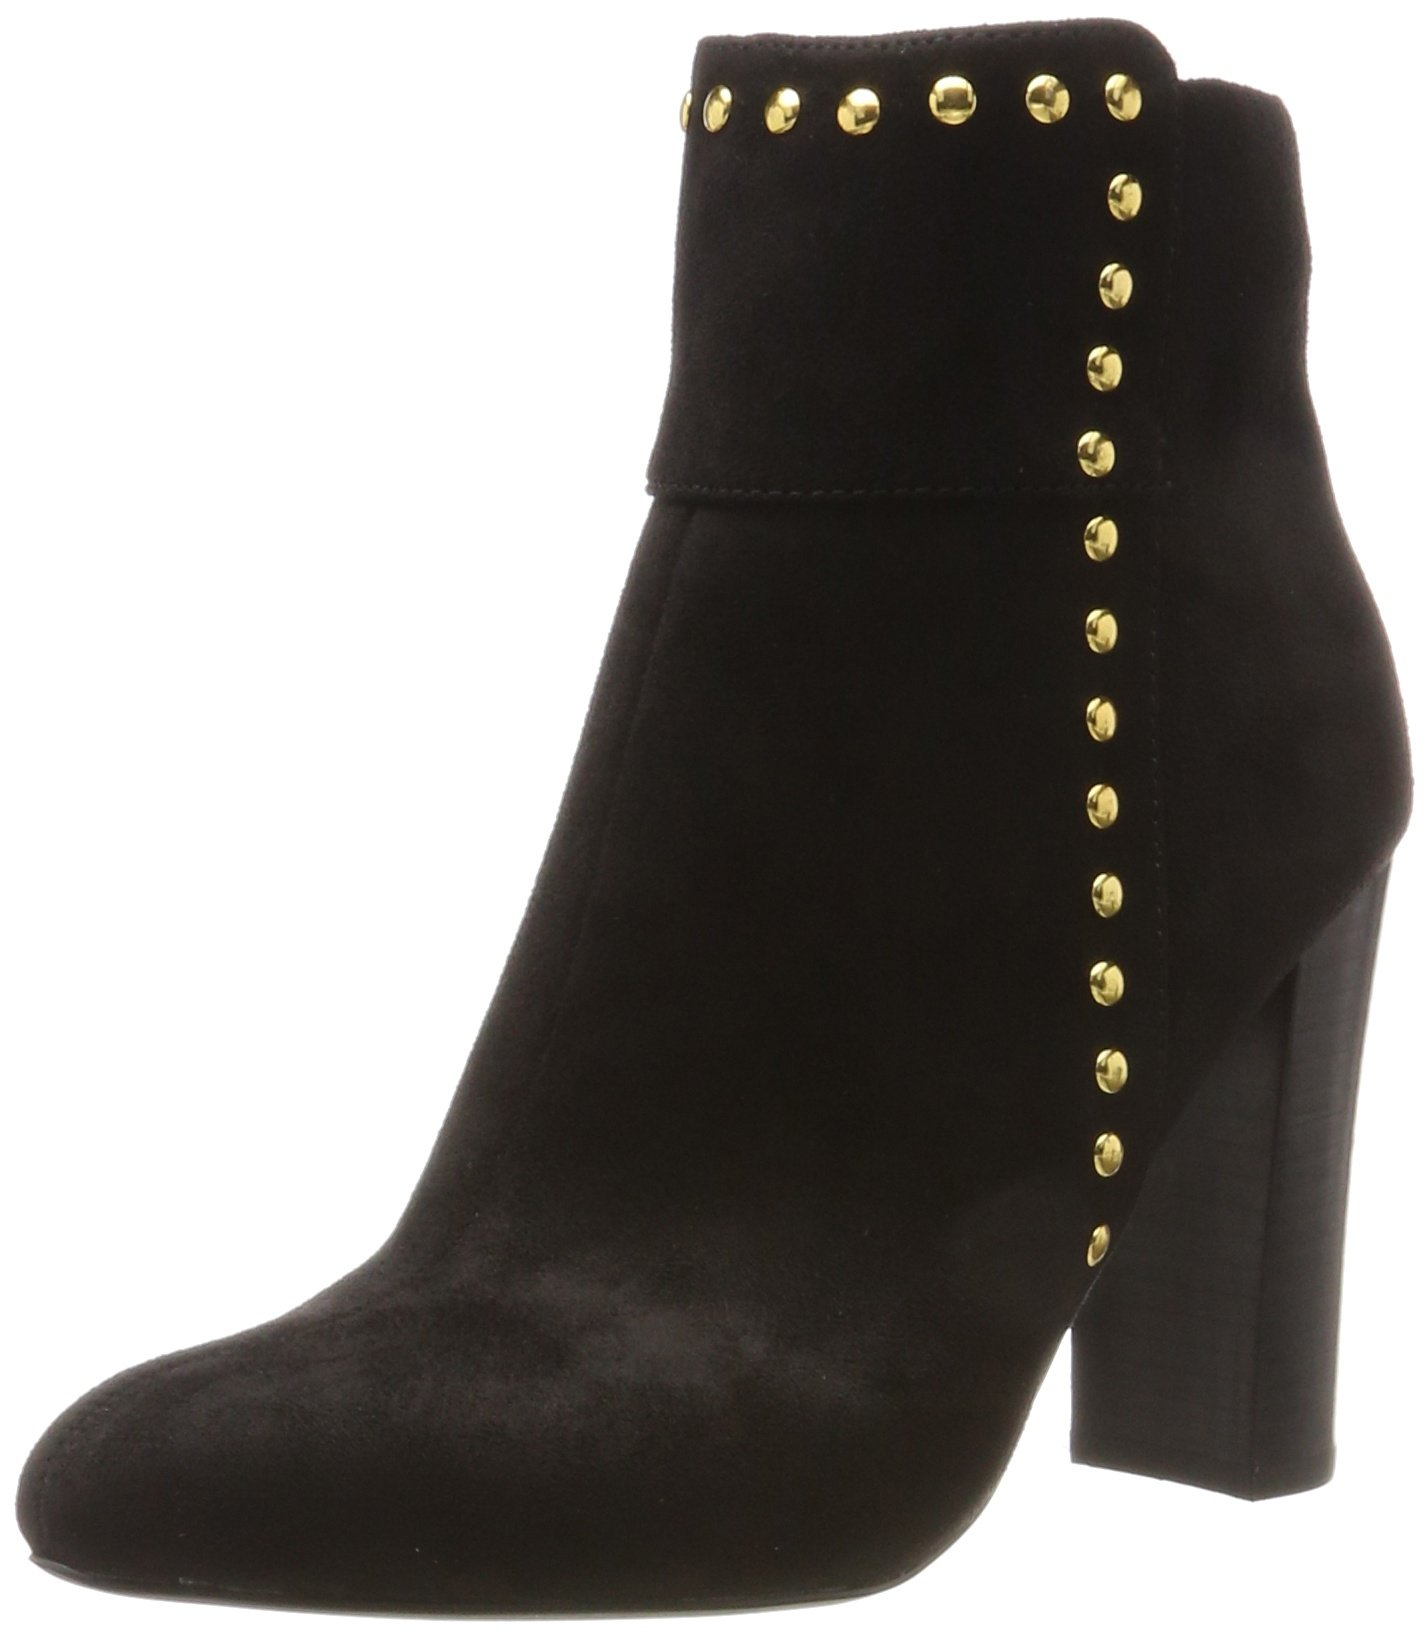 SuedeBottes Bitton Eu Shoes s Imi FemmeNoirblack Buffalo David 1607 049 0138 Rk DHE9I2YW